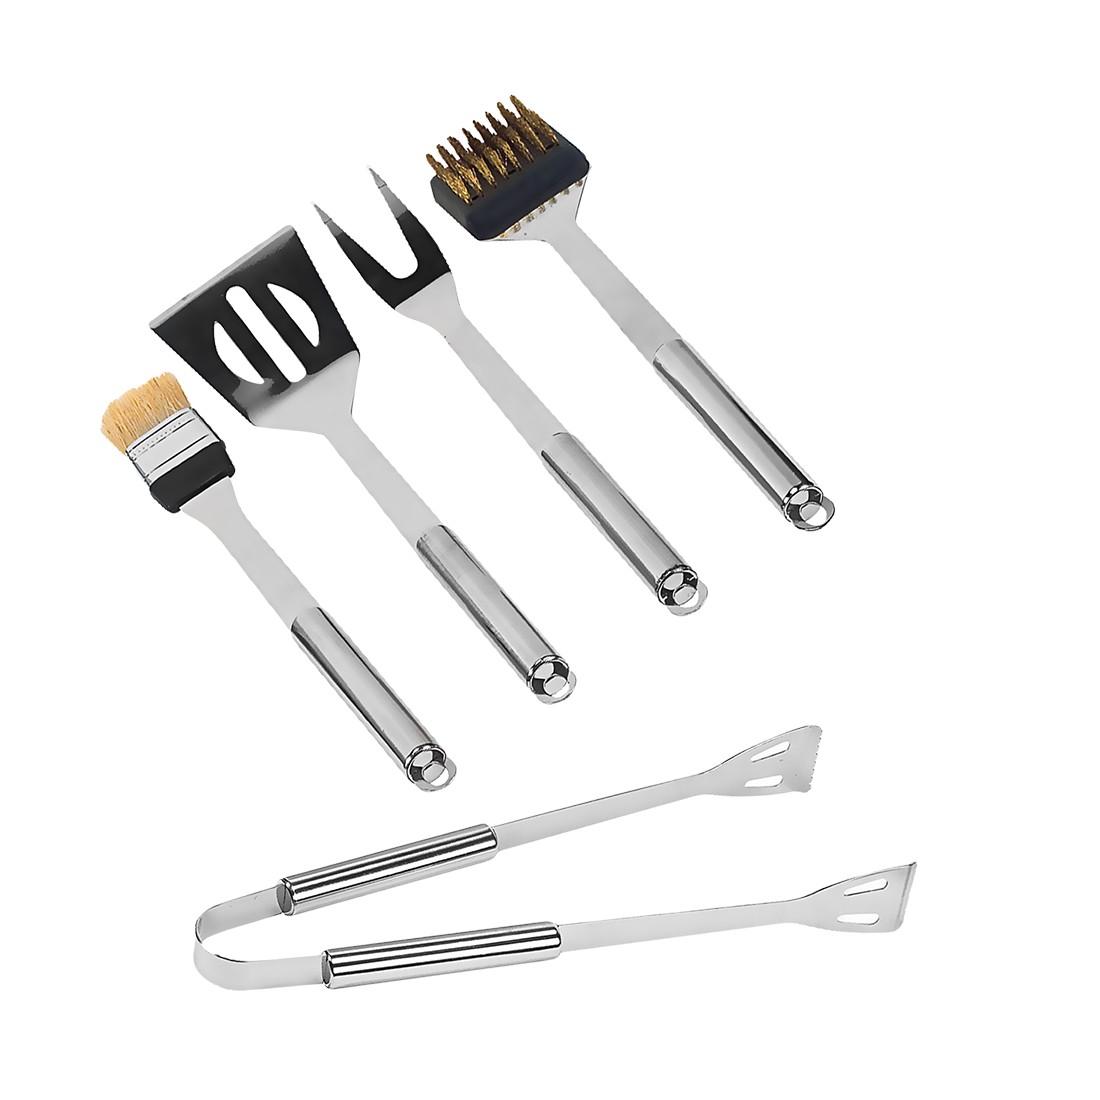 Grillkoffer – Grillzubehör: Edelstahl, Koffer: Aluminium Silber – 5-teilig, Gusta jetzt bestellen